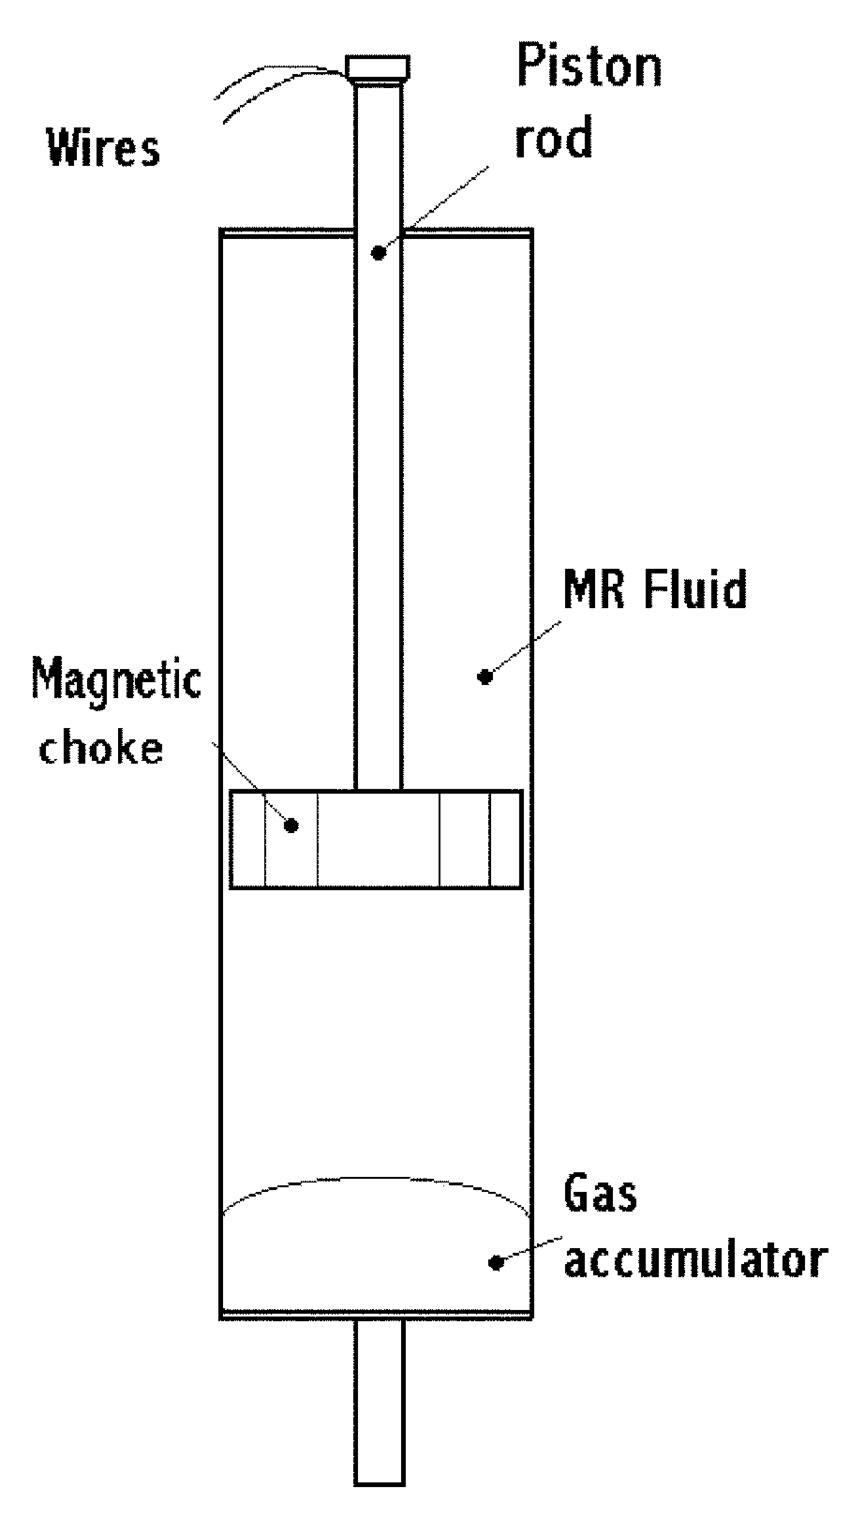 medium resolution of schematic of the mrd